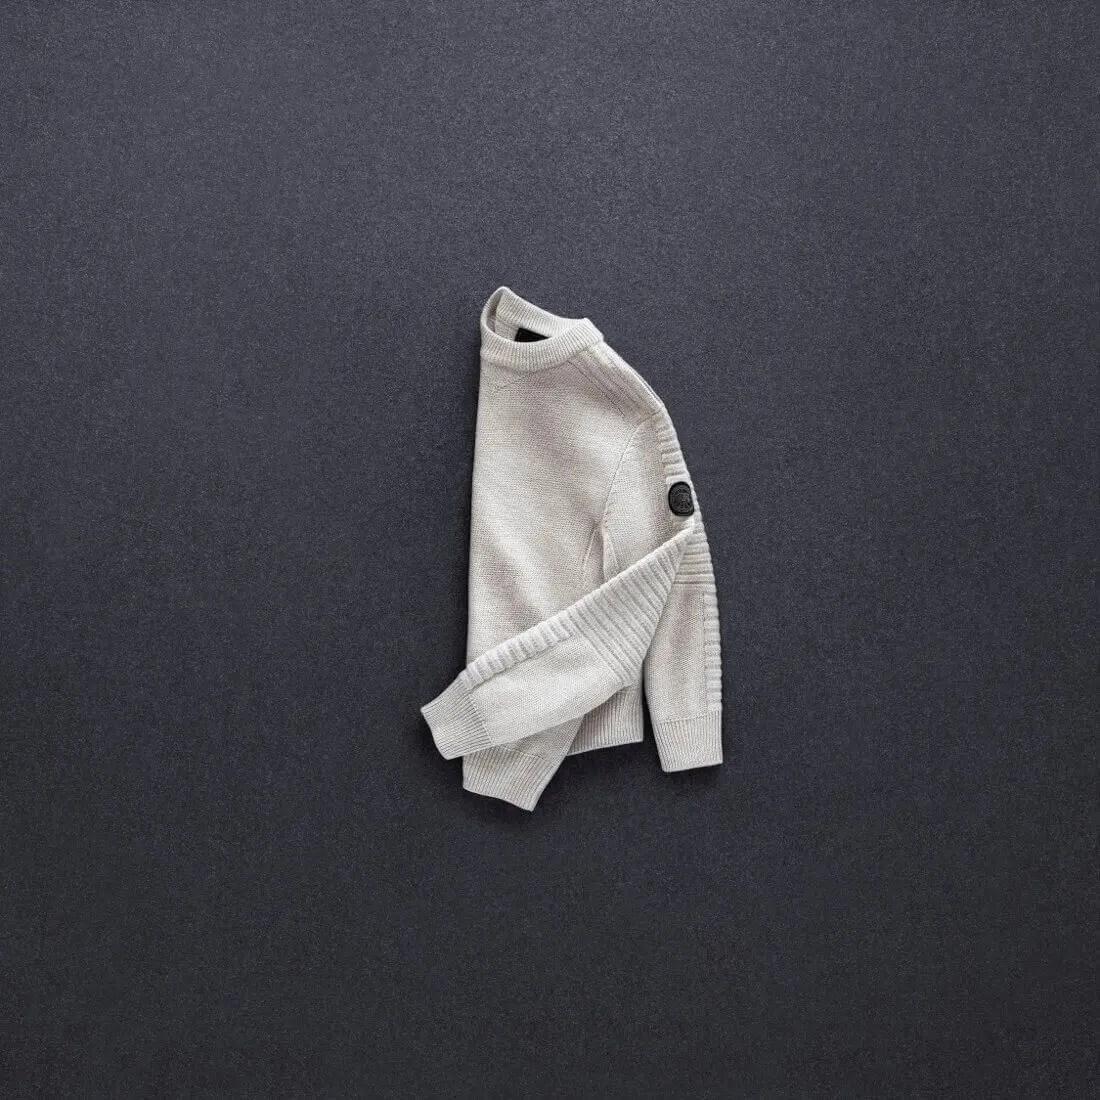 paterson_product_white_final-copy